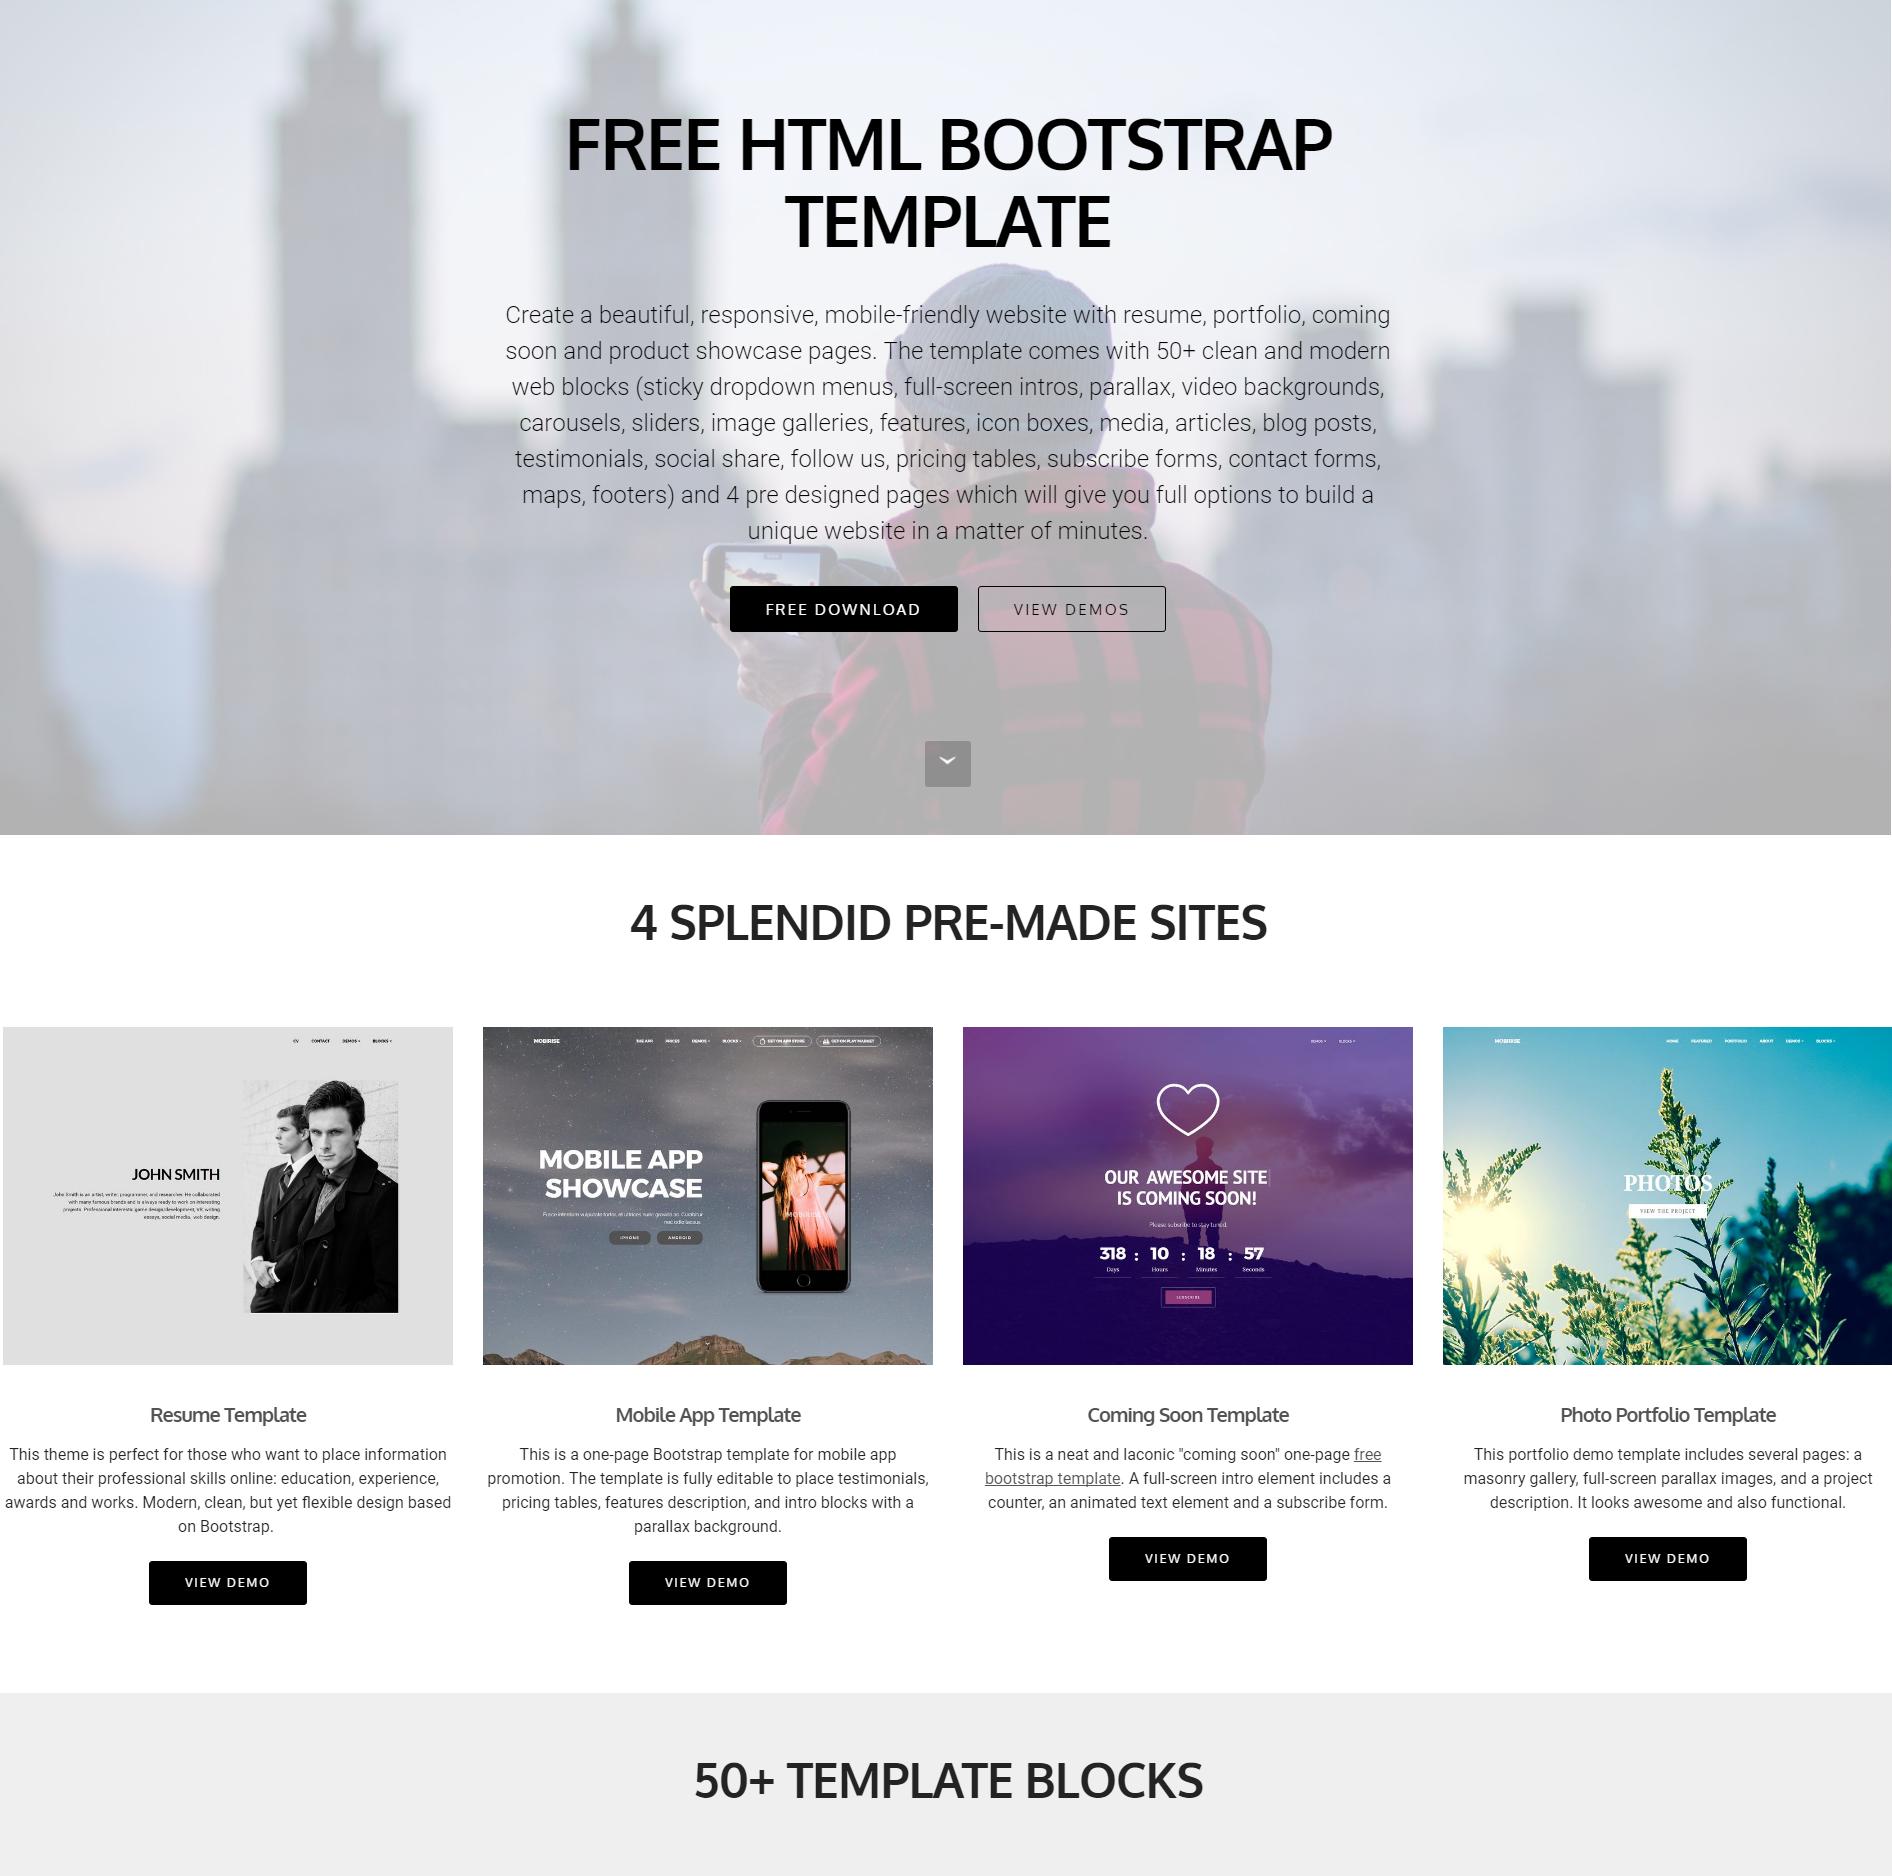 HTML Bootstrap 4 Blocks Templates